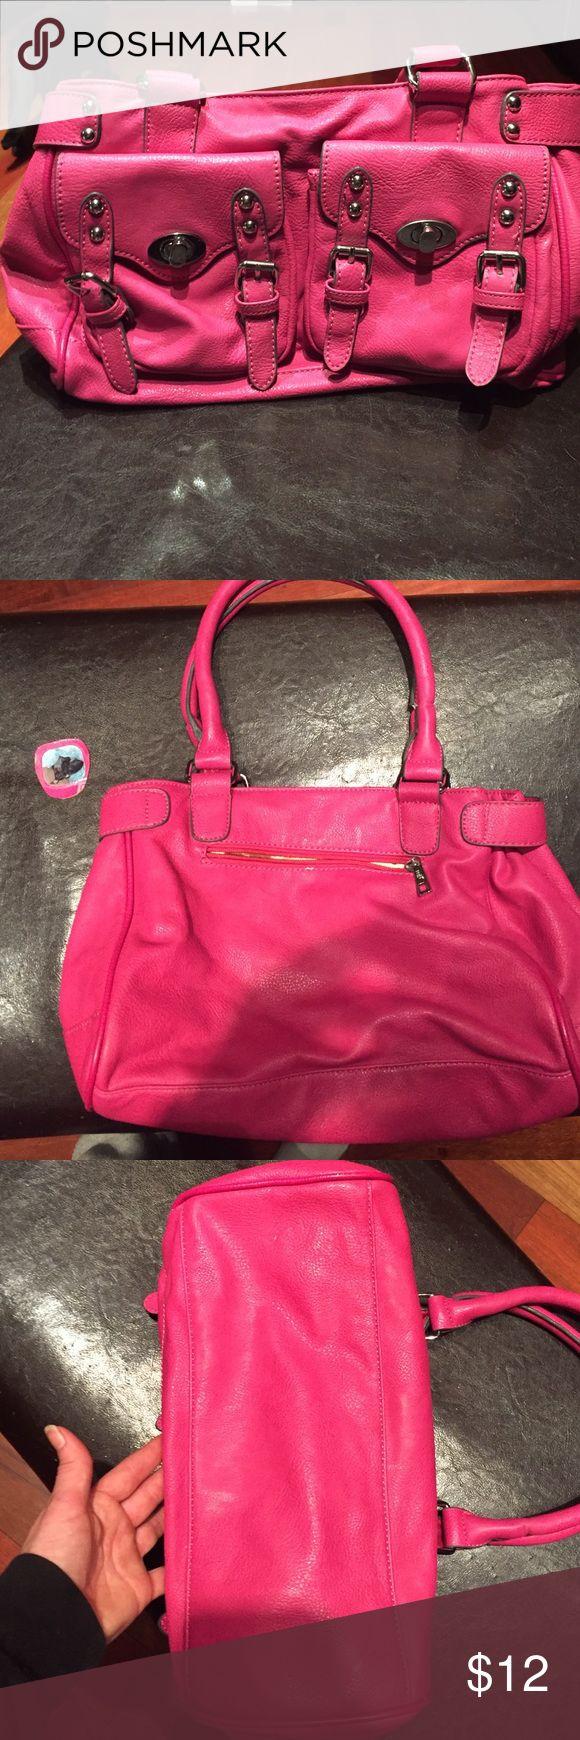 Melie Bianco Handbag Gently used Melie Bianco Handbag. Few pen marks inside. Outside on back near zipper small scratch. Melie Bianco Bags